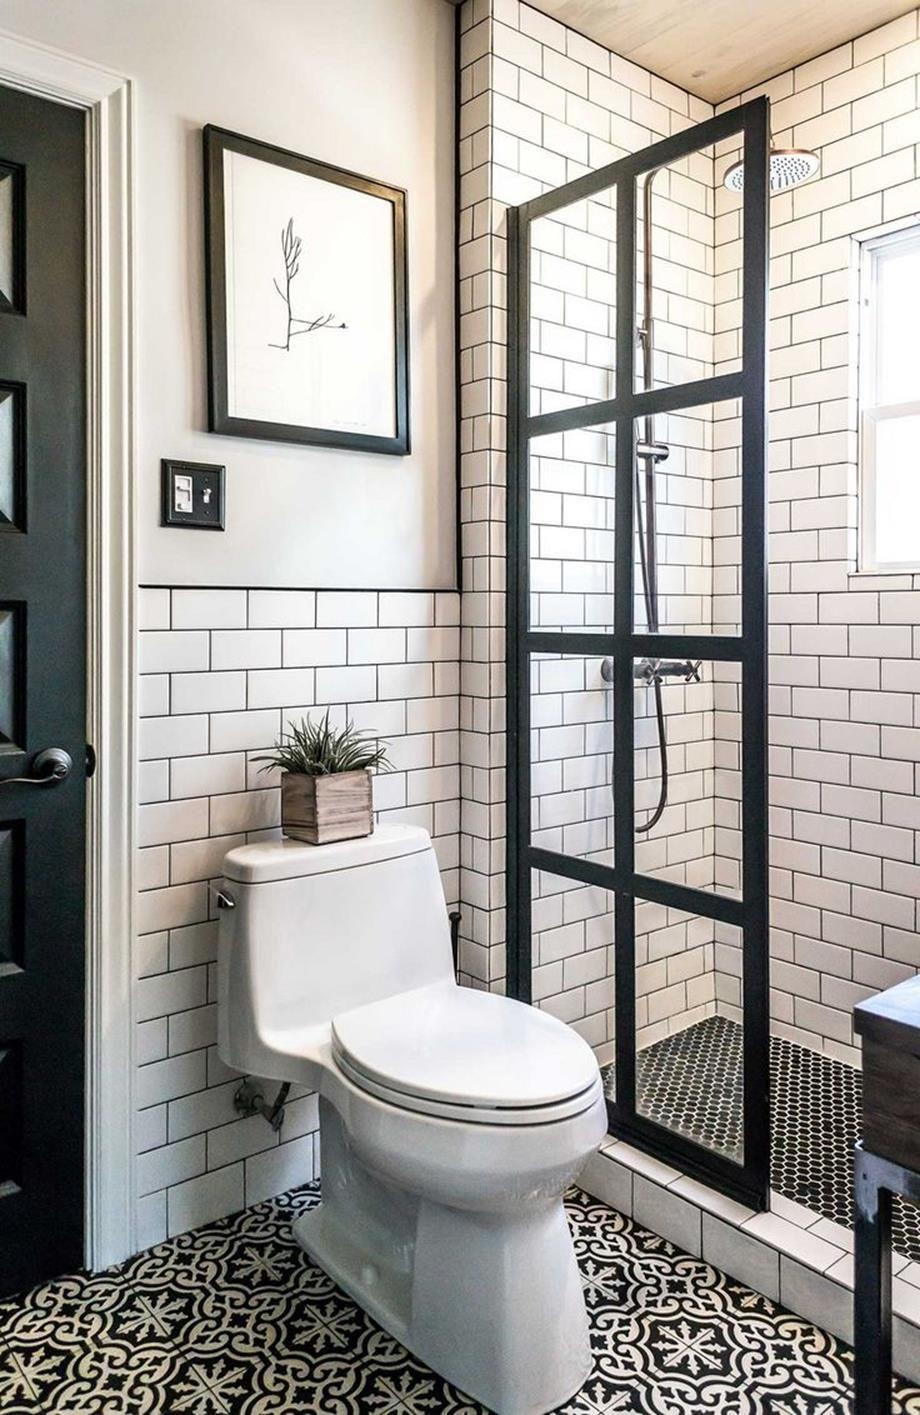 39 Gorgeous Spa Bathroom Makeover Ideas On a Budget | Spa bathrooms ...